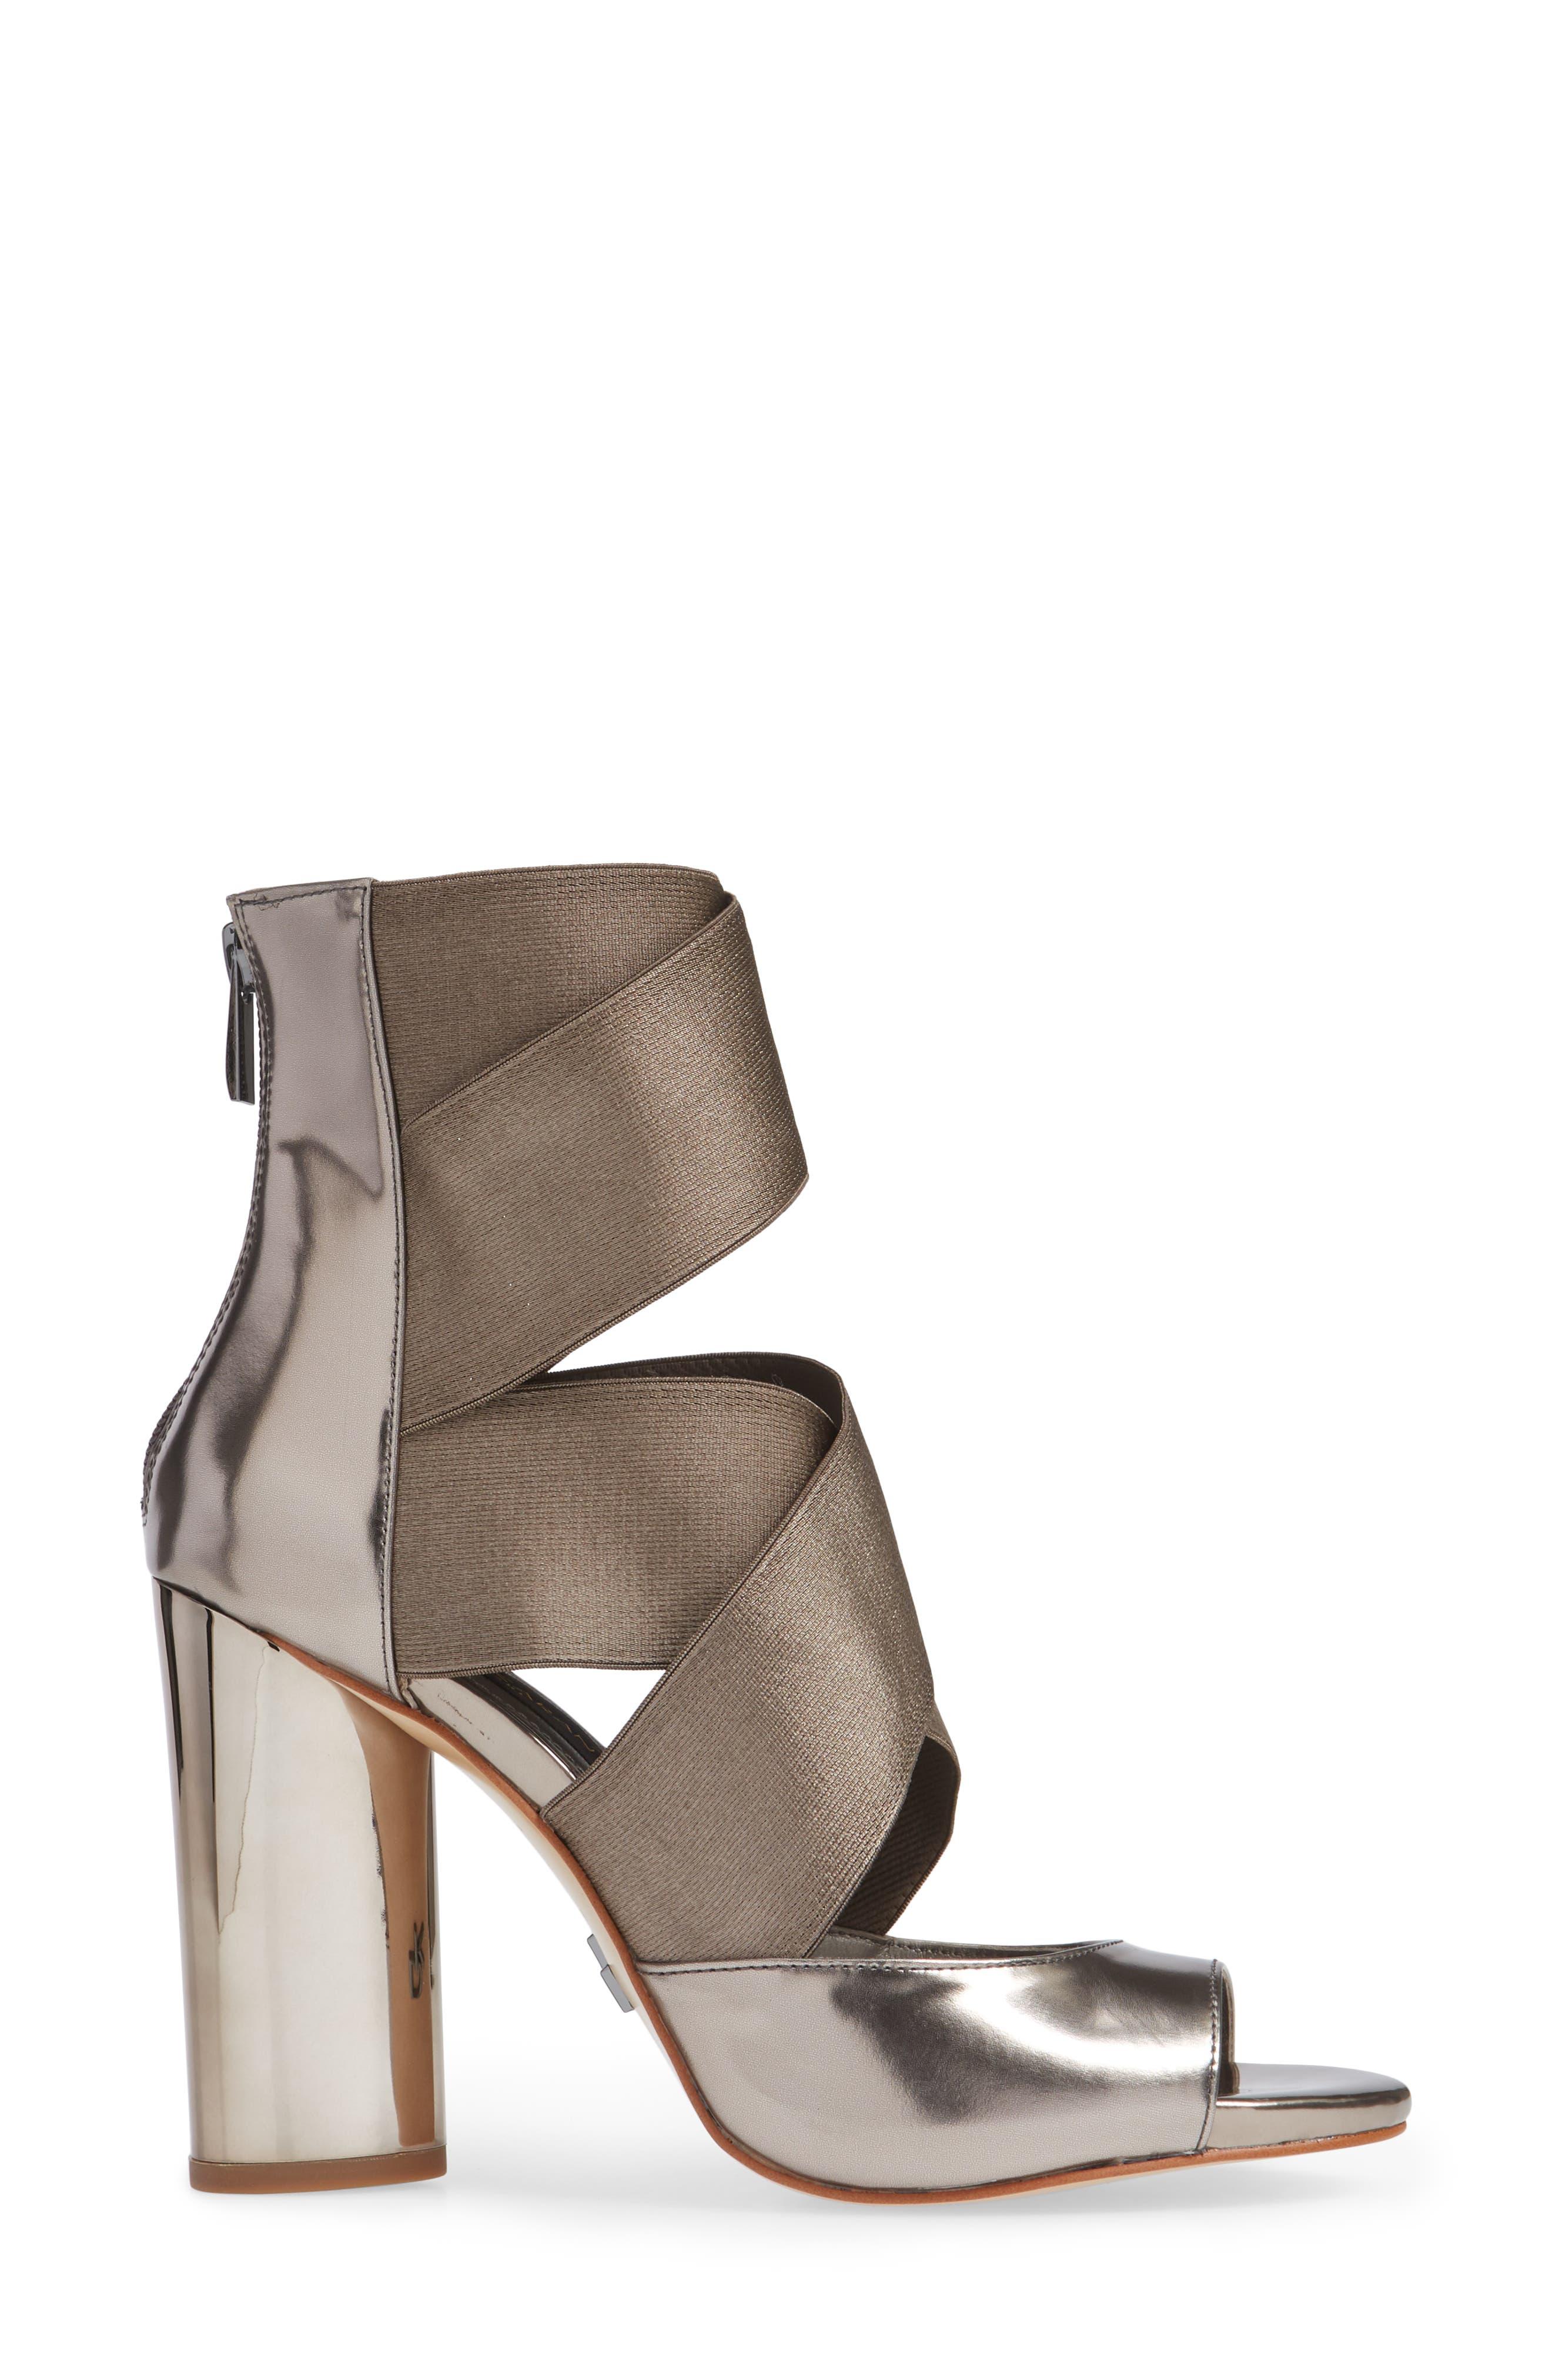 Donna Karan Briana Strappy High Sandal,                             Alternate thumbnail 3, color,                             DARK PEWTER